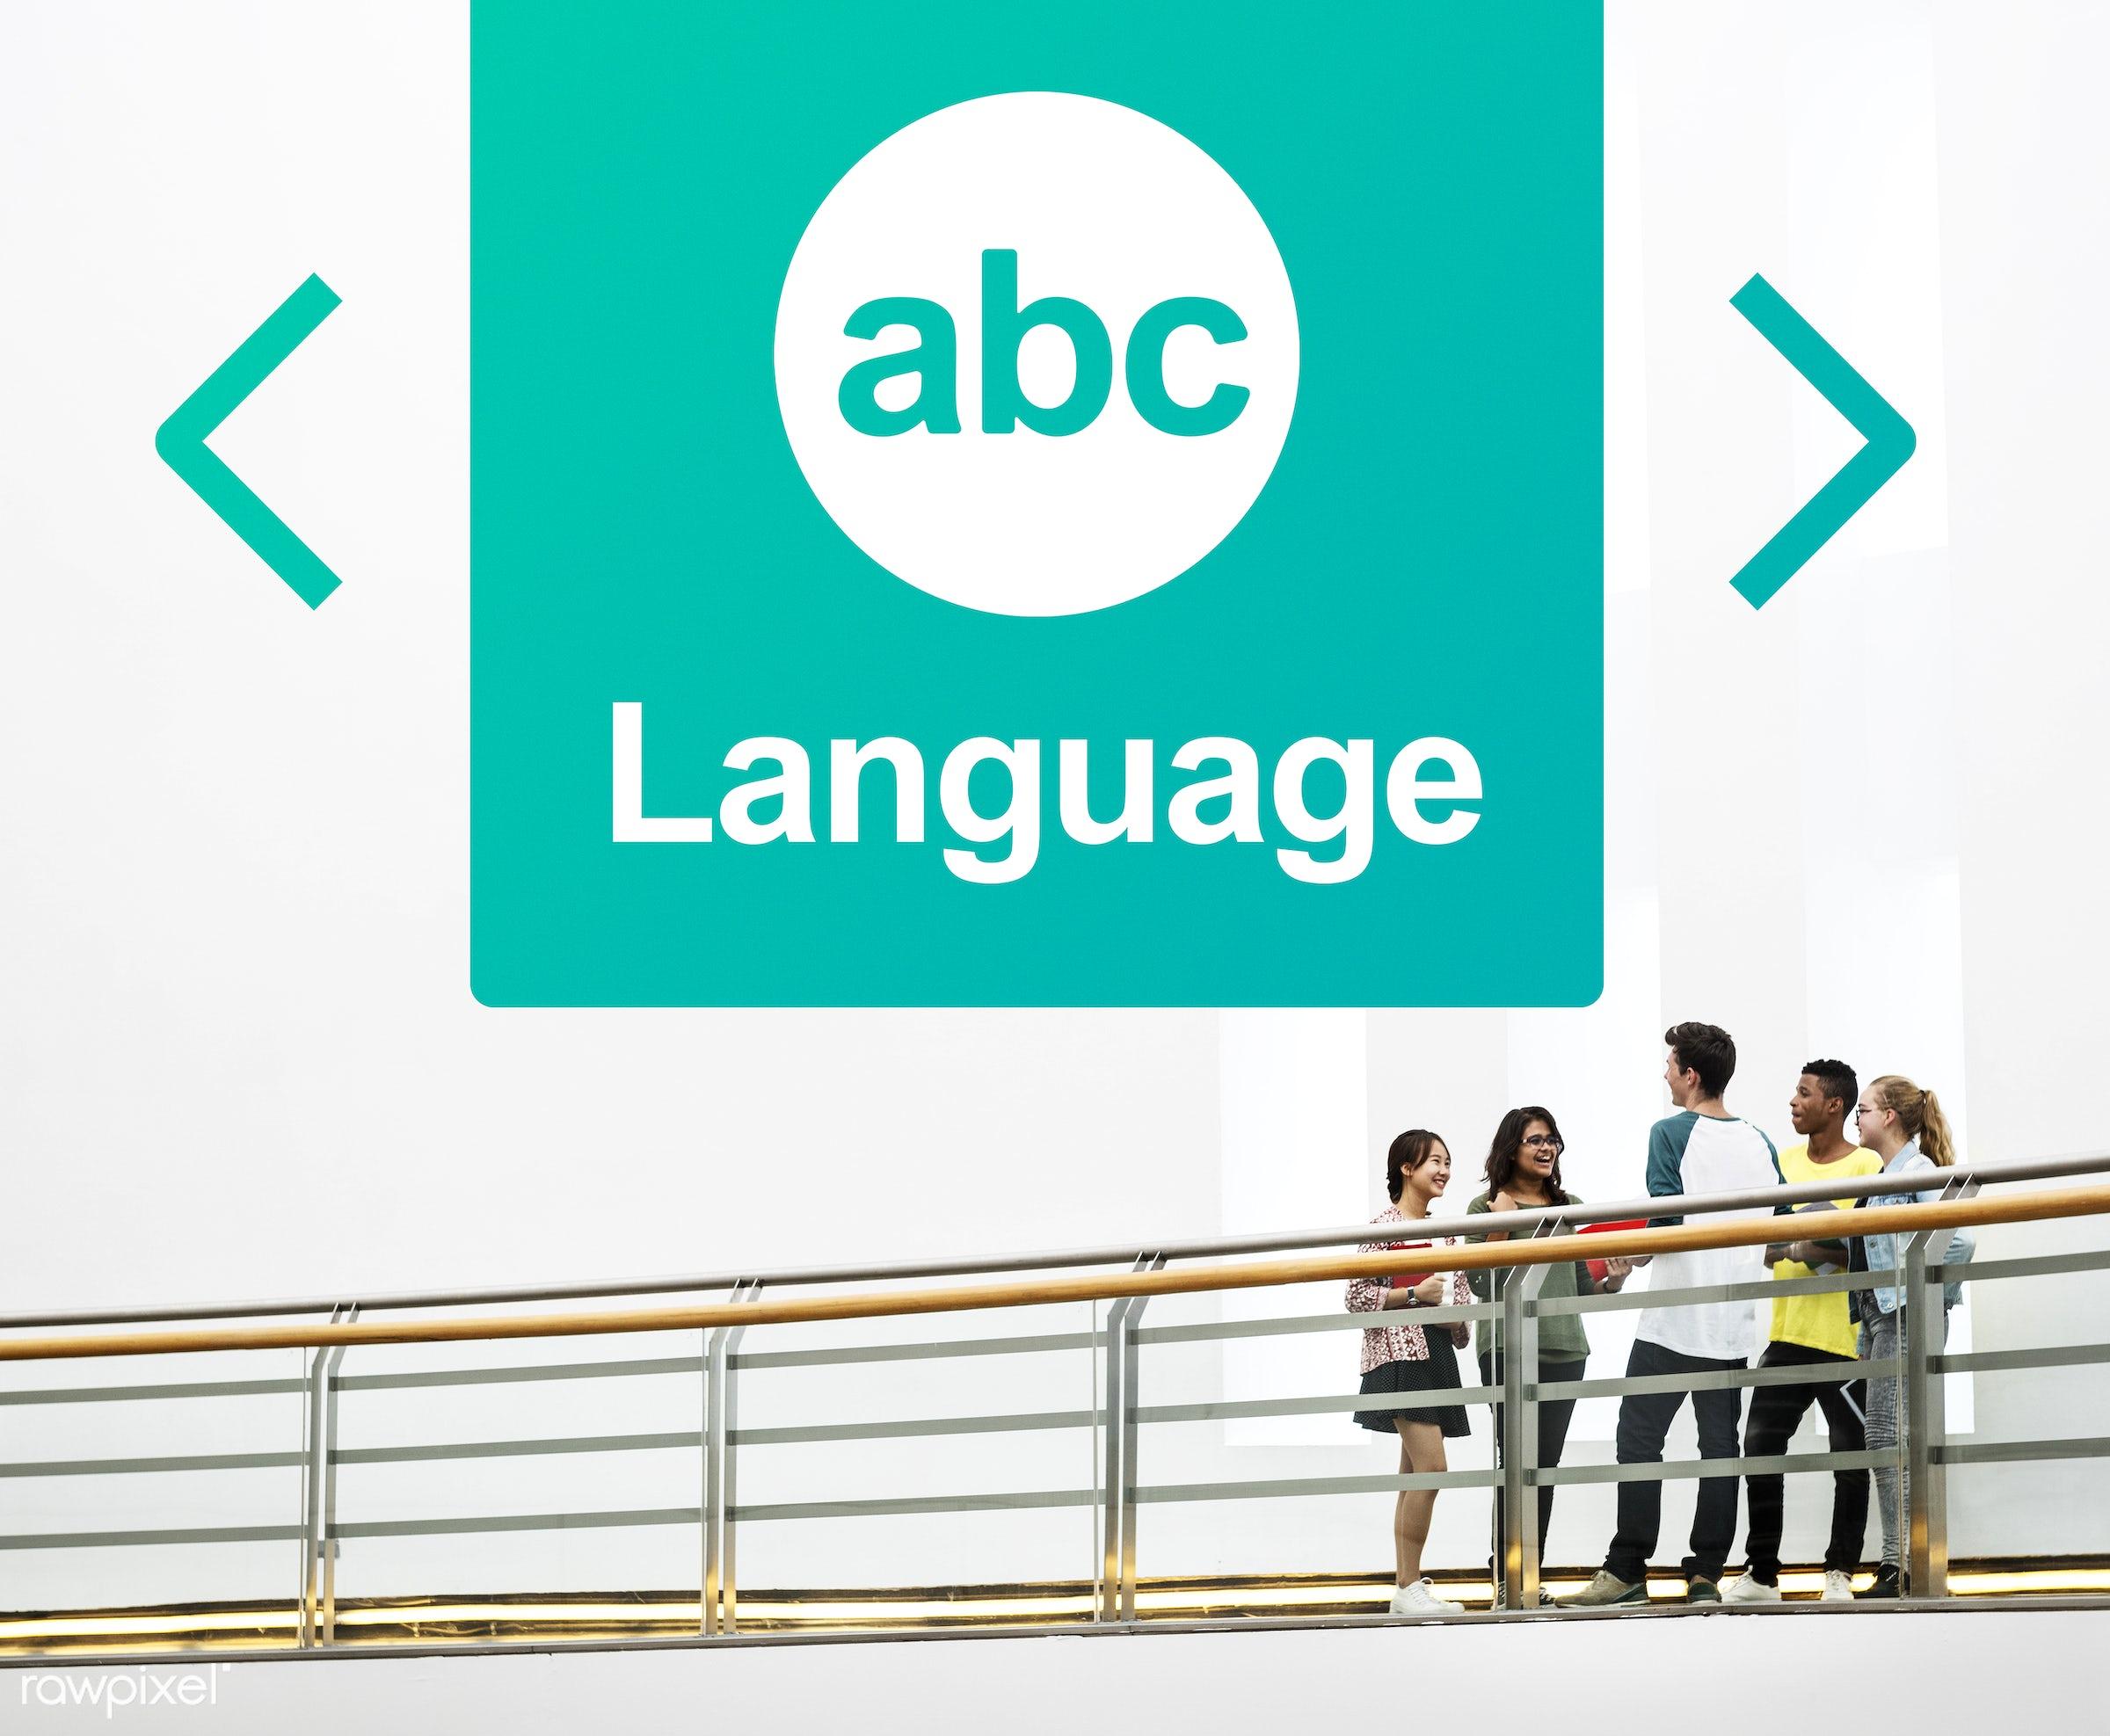 abc, alphabet, book, books, boy, bridge, carrying, communication, dictionary, educate, english, font, friends, friendship,...